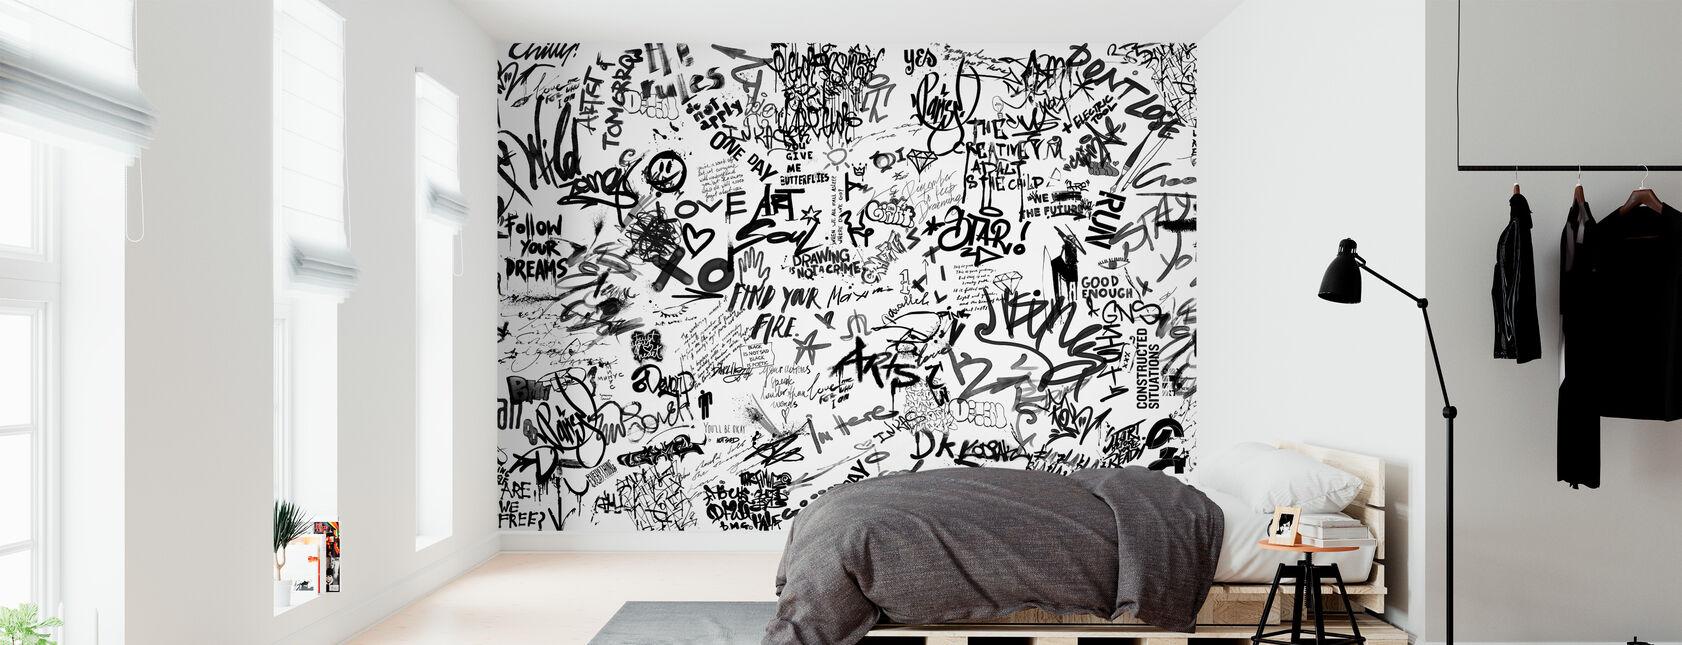 Street Art Poetry - Bw - Wallpaper - Bedroom